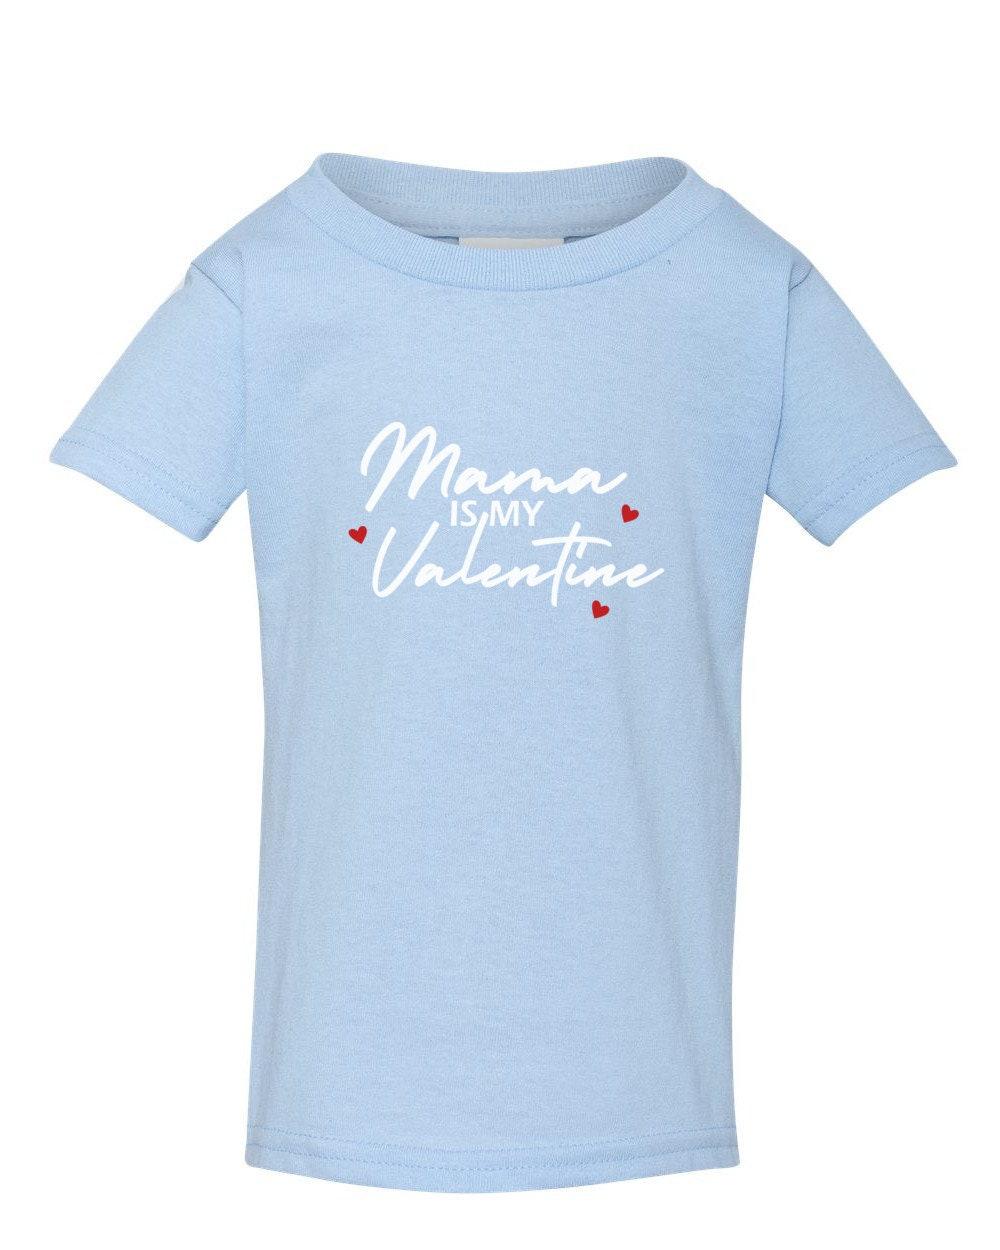 Mommy Is My Valentine Youth Shirt Boys Valentine/'s Day Shirt Valentine Love Tee